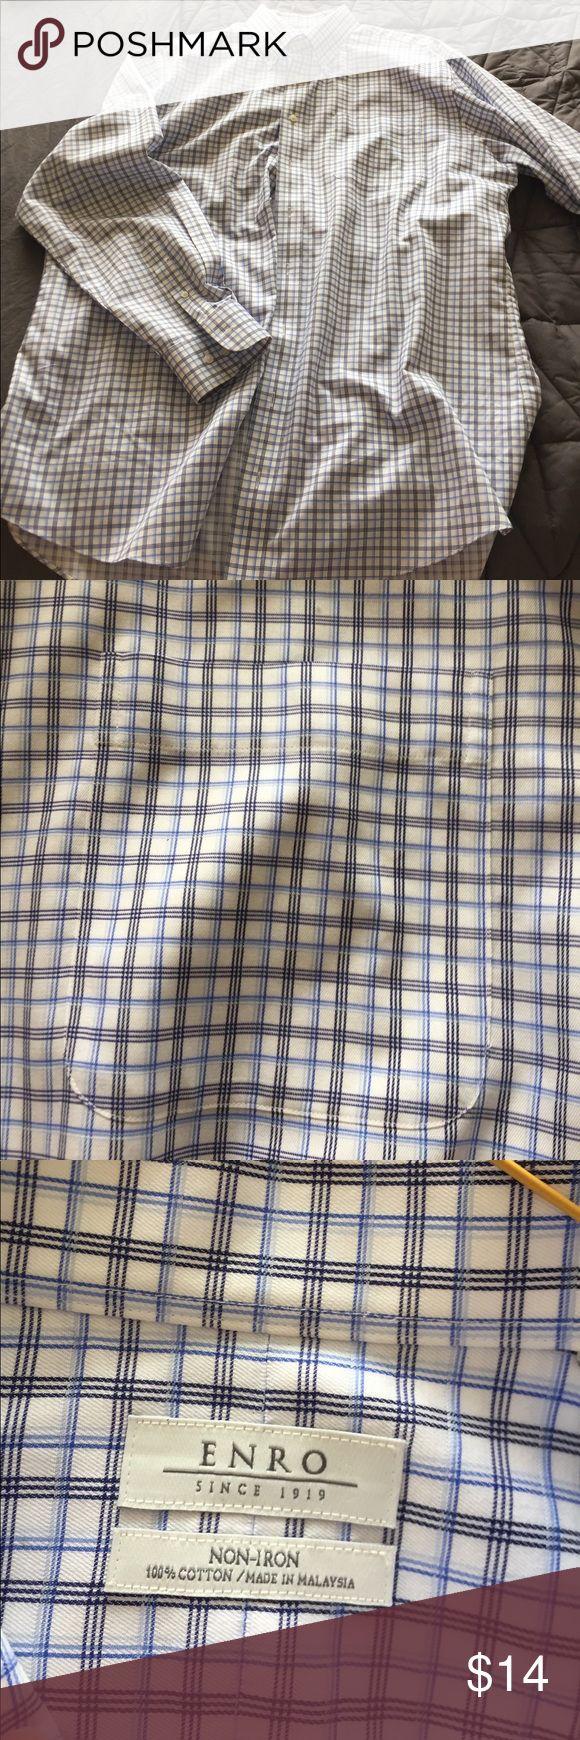 Men's Enro non-iron dress shirt Light and dark blue plaid; 17.5 neck; 36-37 Enro Shirts Dress Shirts